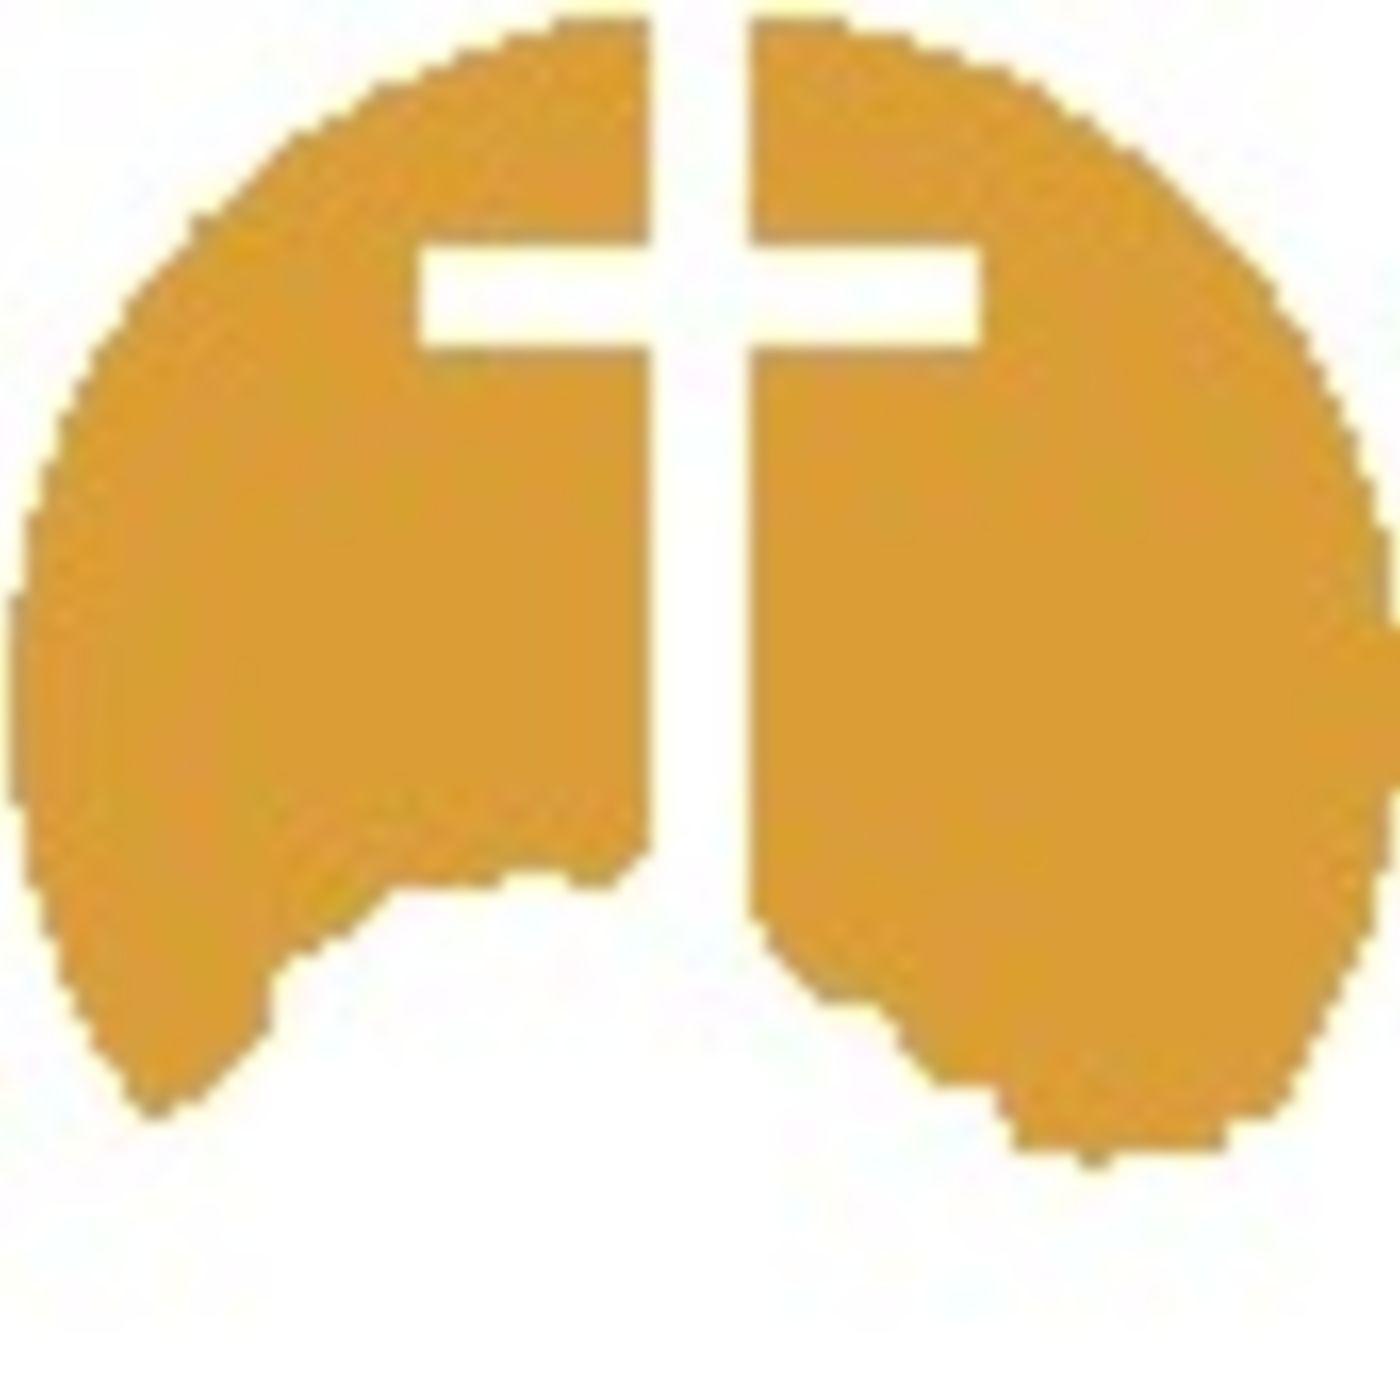 The Purpose, Pillars, & Foundation of KBC - The Pillars - Part 4: Passionate Worship of Christ